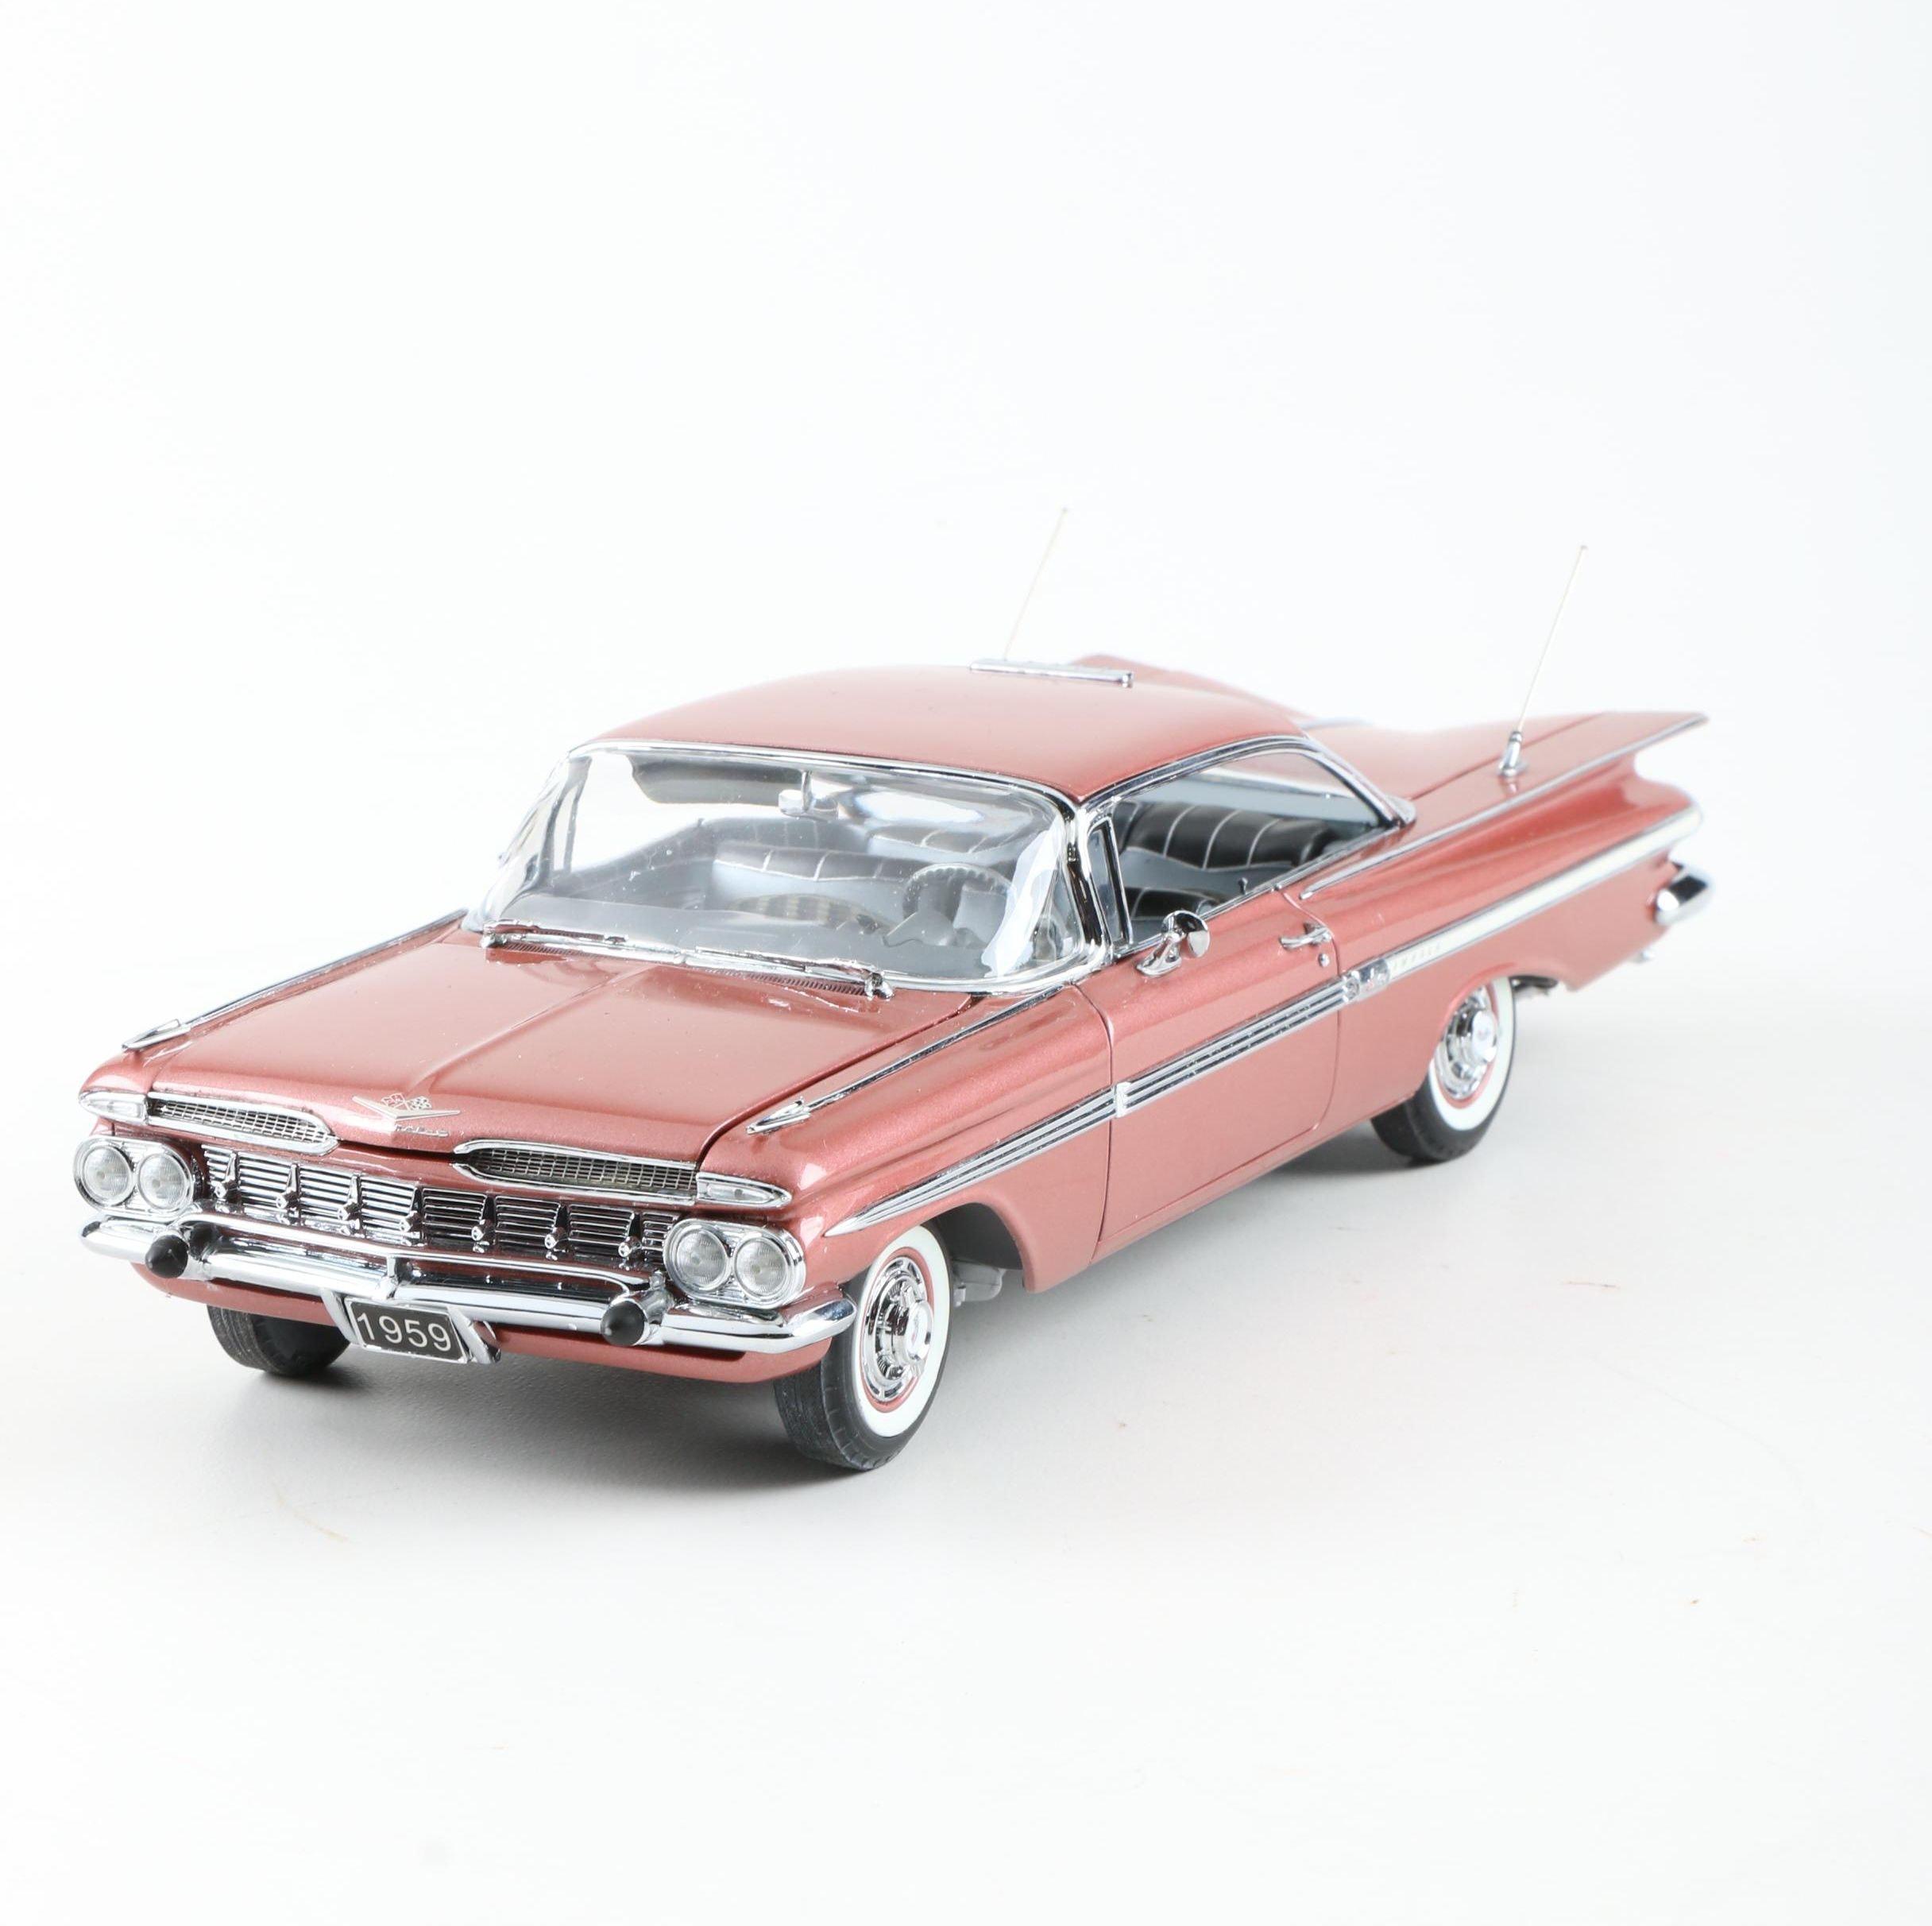 1959 Chevrolet Impala by Danbury Mint